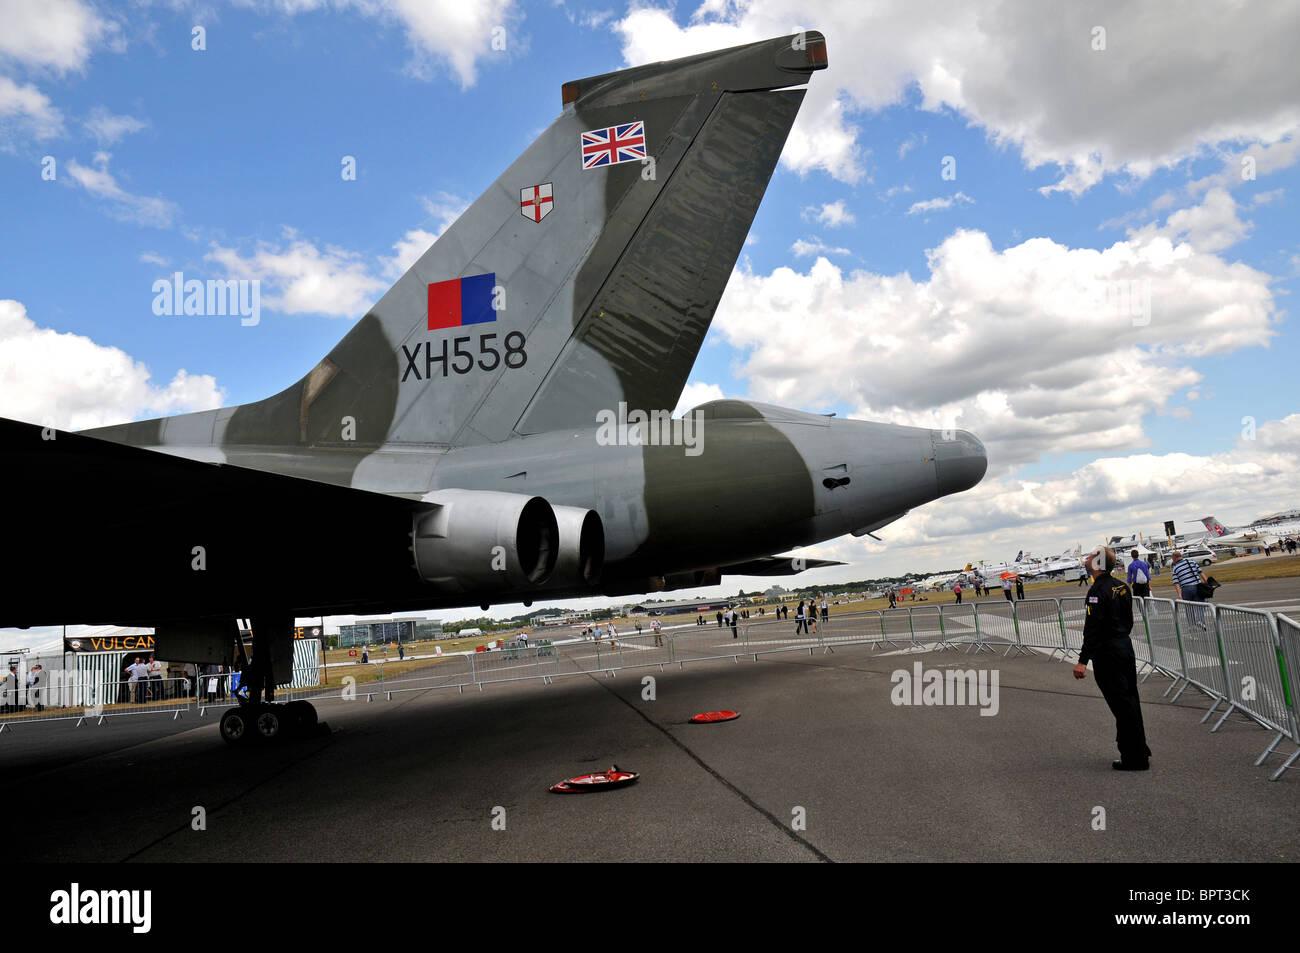 Avro Vulcan bomber, Vulcan delta wing warplane - Stock Image